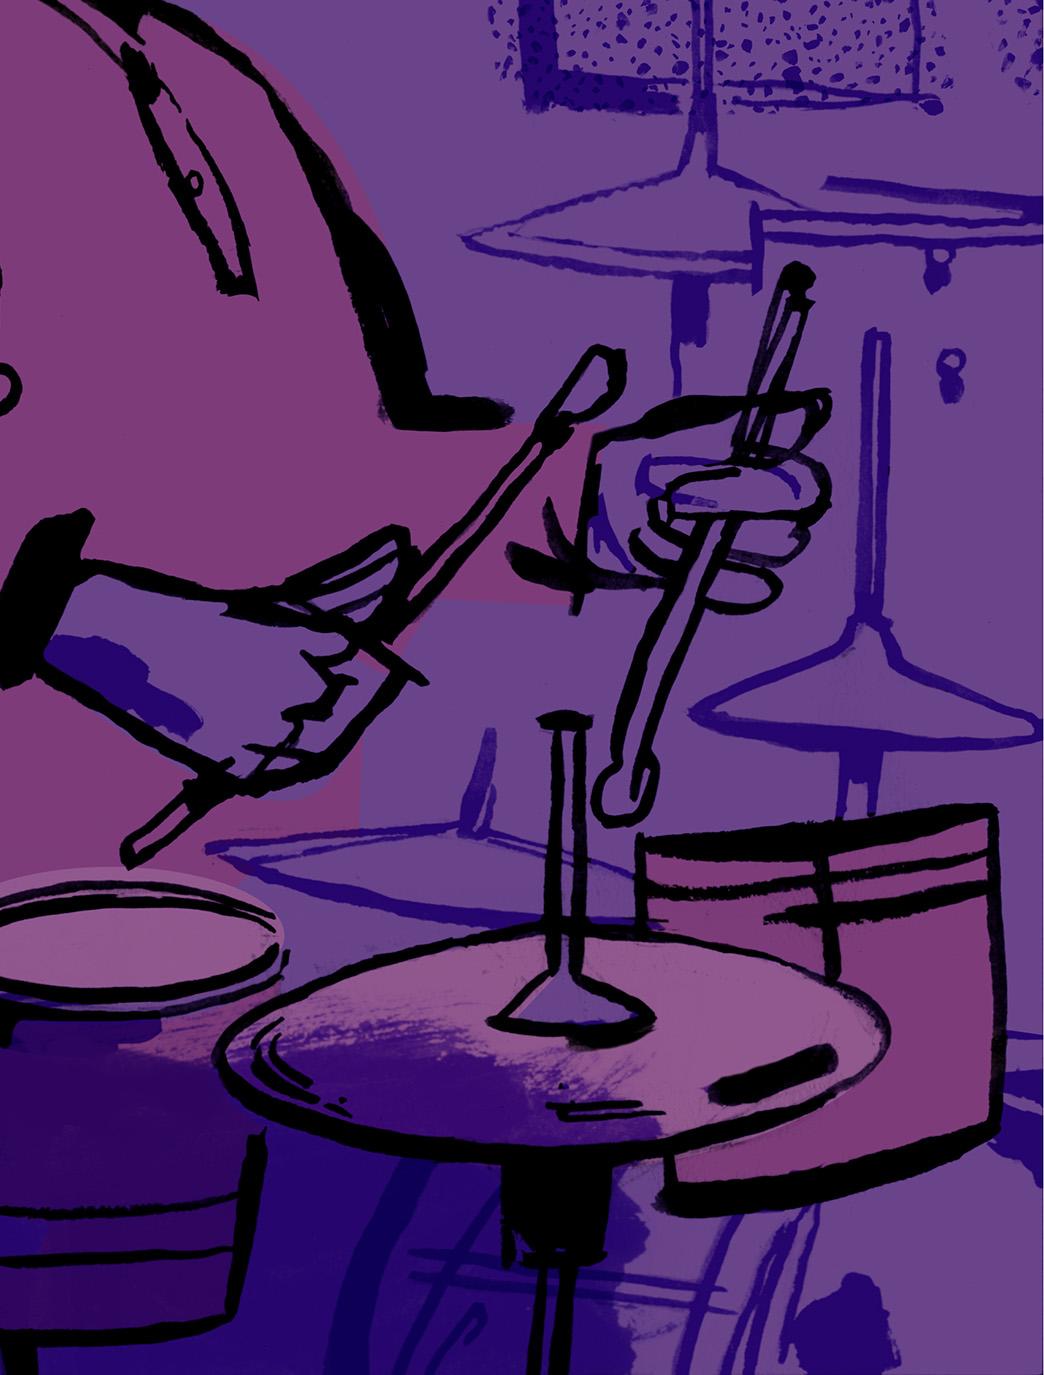 drummer_hands.jpg